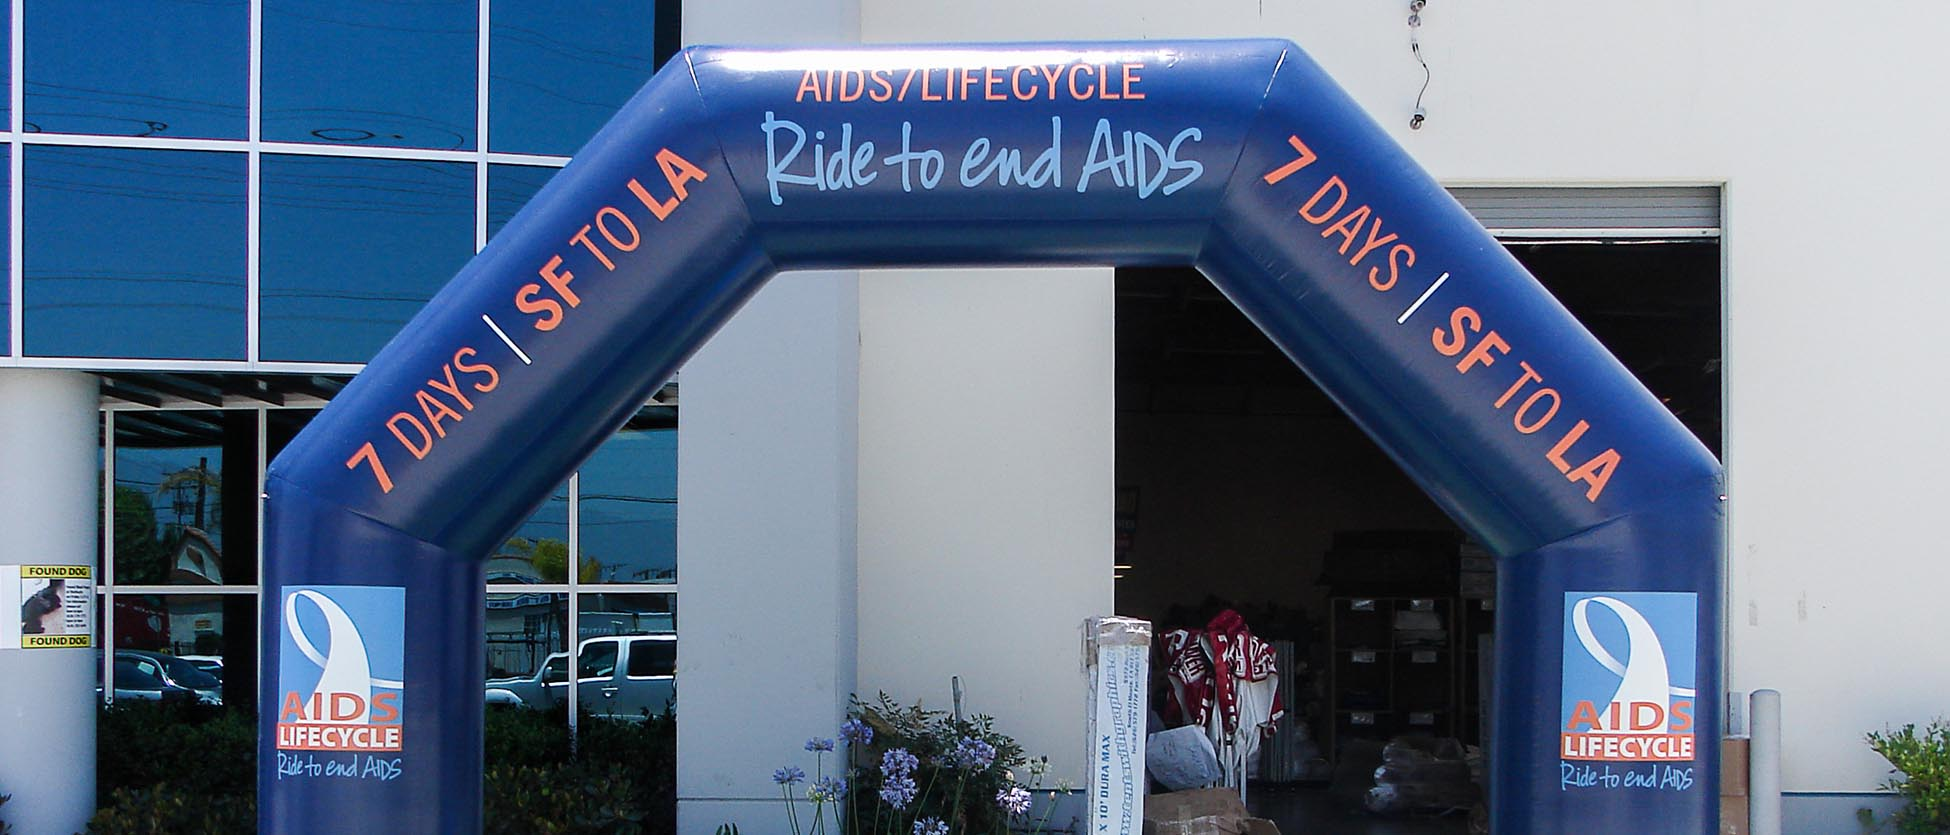 aids-lifecycle-header.jpg